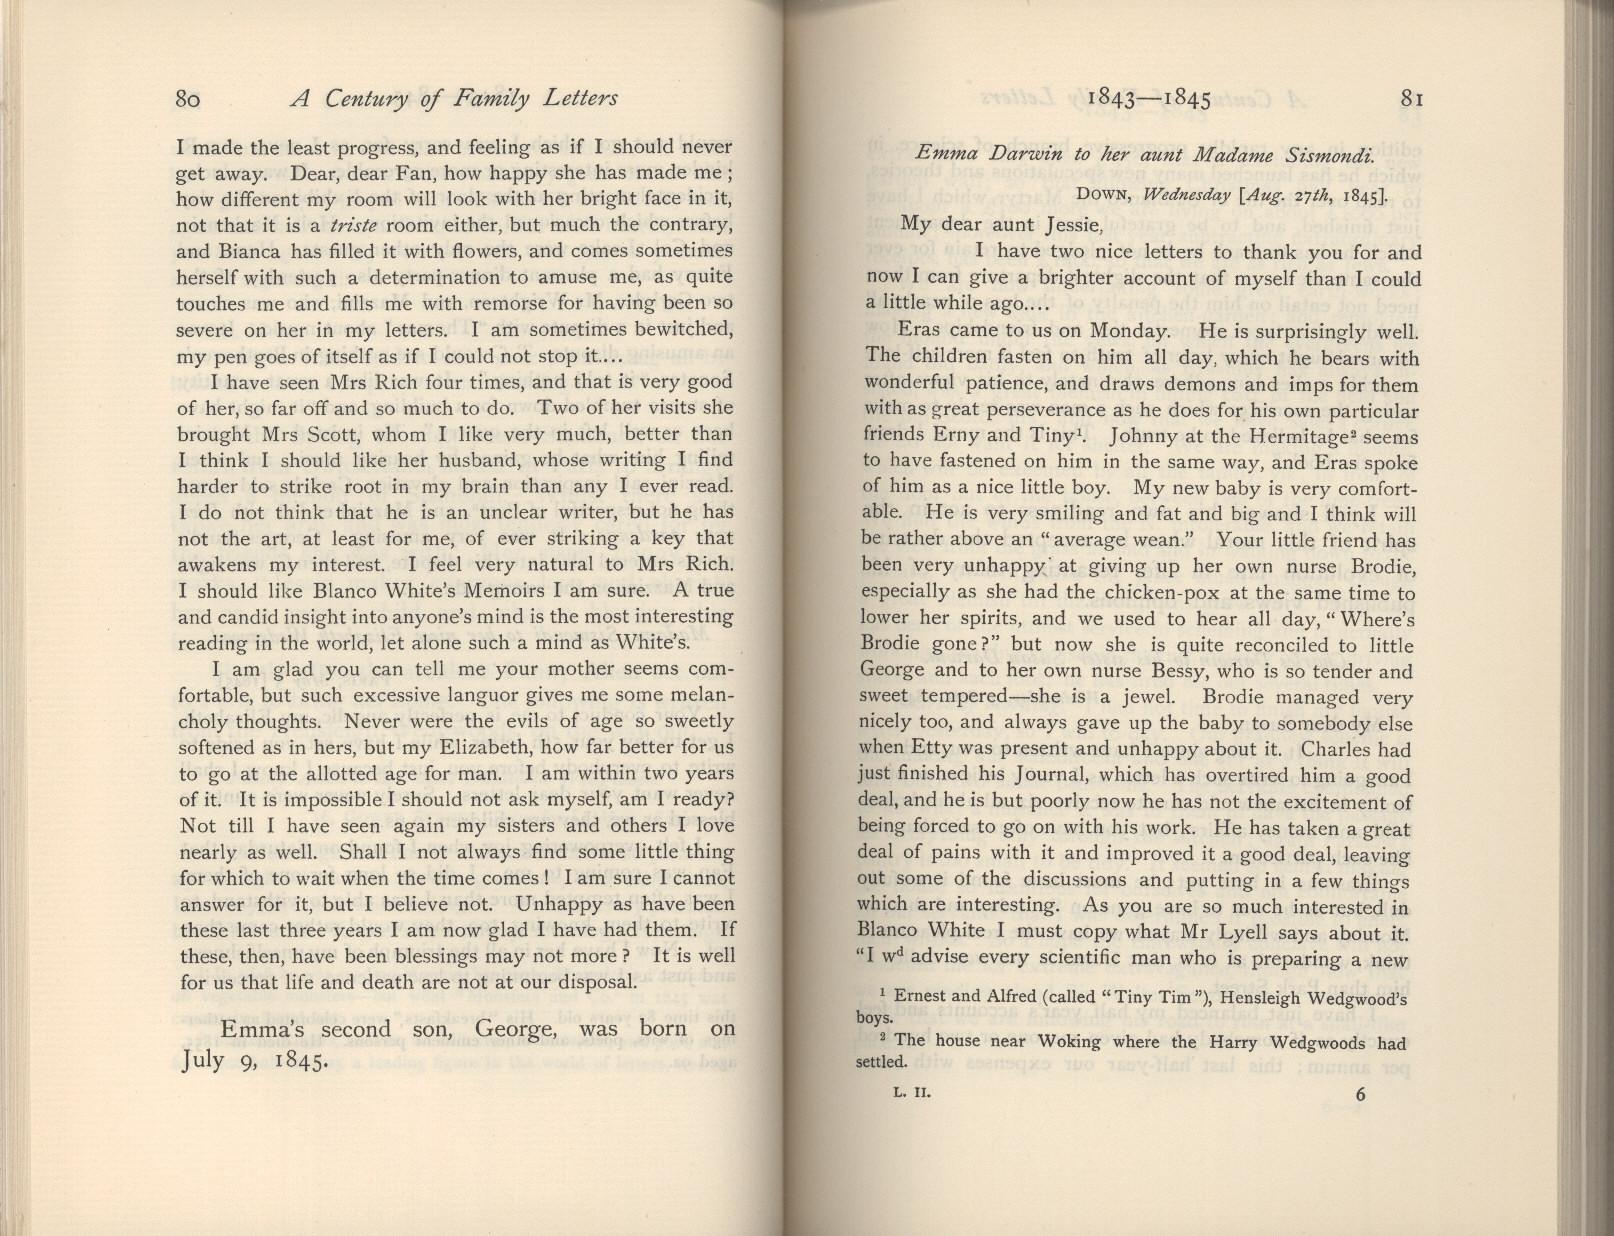 Litchfield, H. E. ed. 1904. Emma Darwin, wife of Charles Darwin. A century  of family letters. Cambridge: University Press printed. Volume 2.